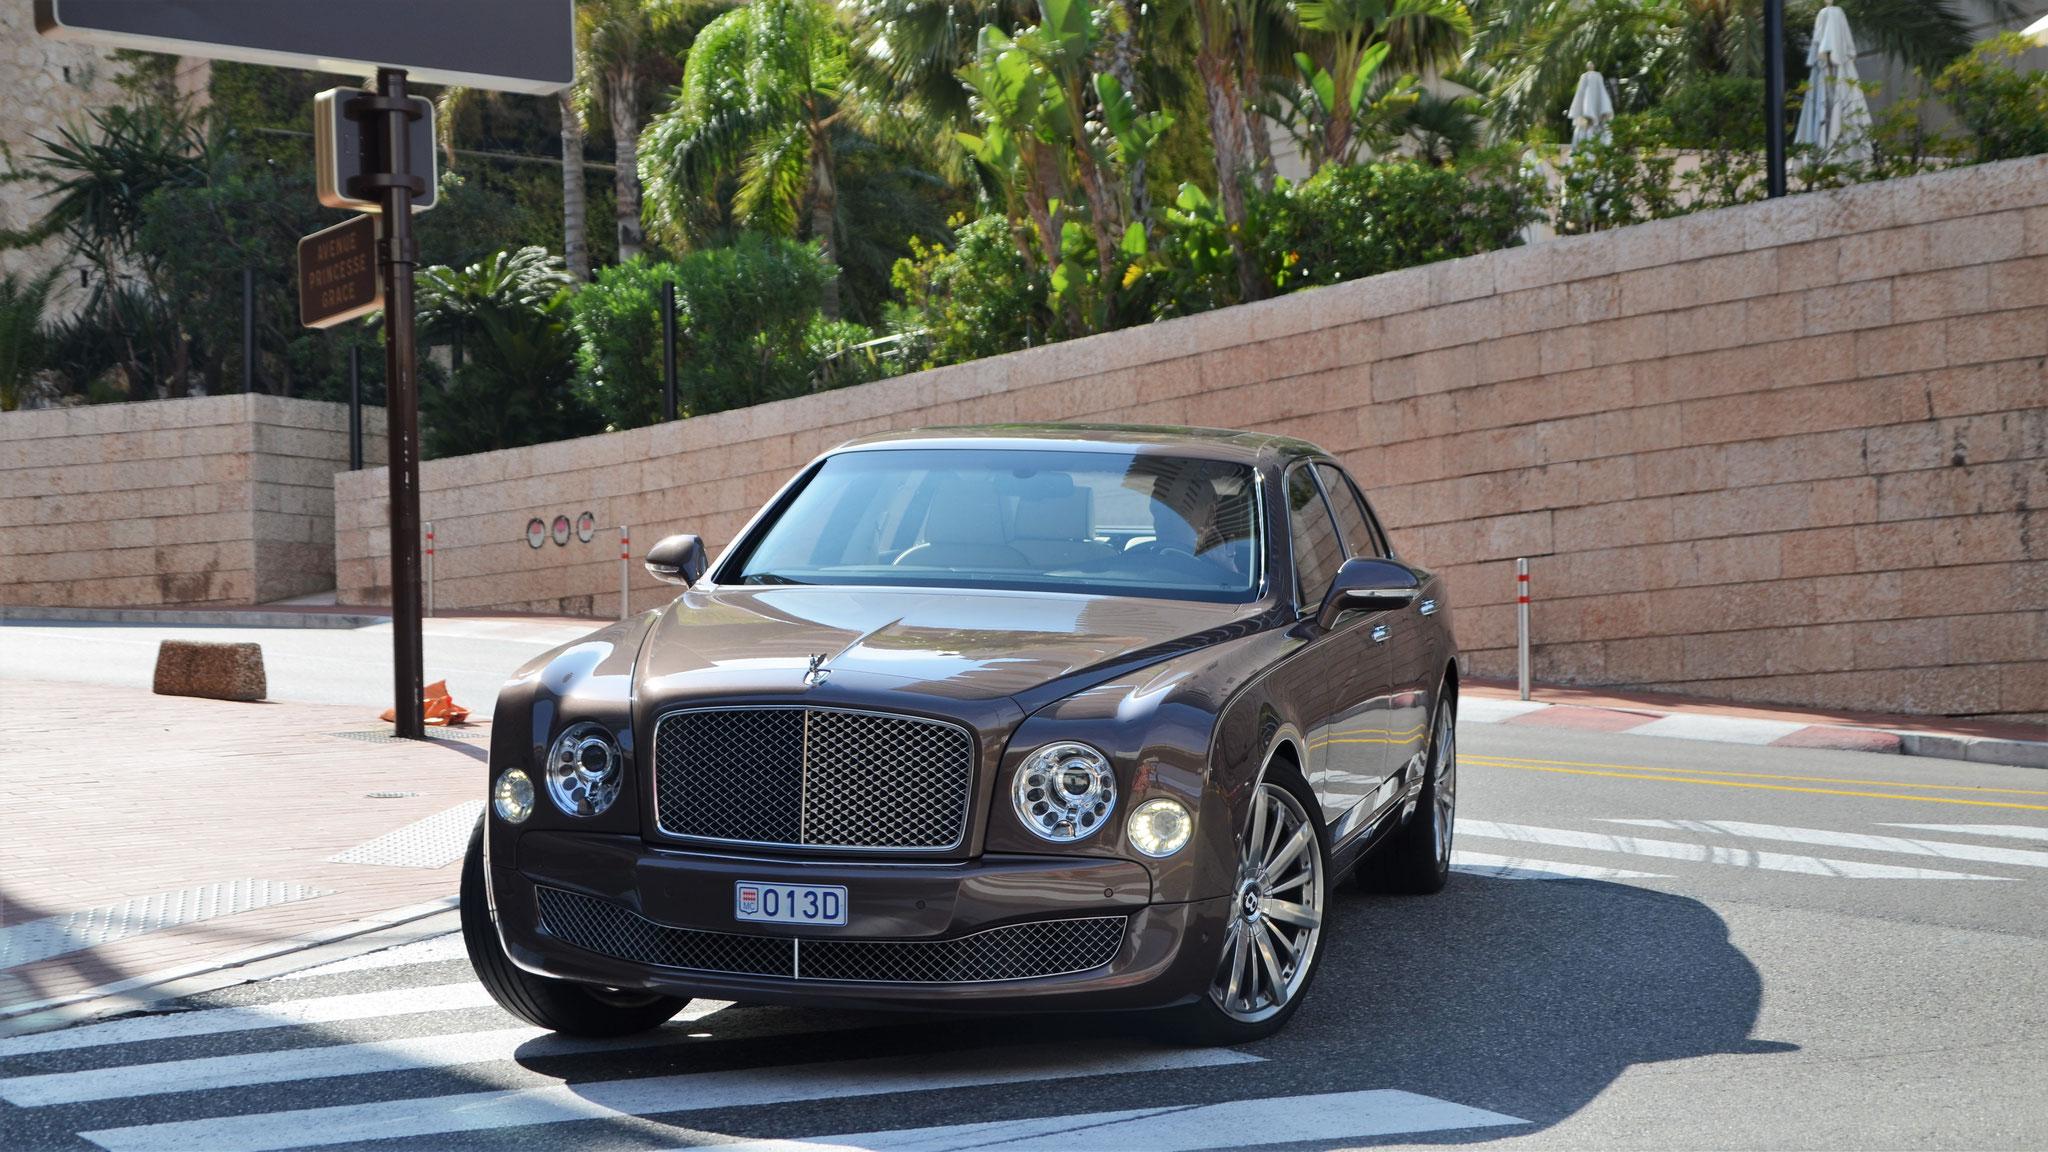 Bentley Mulsanne -013D (MC)